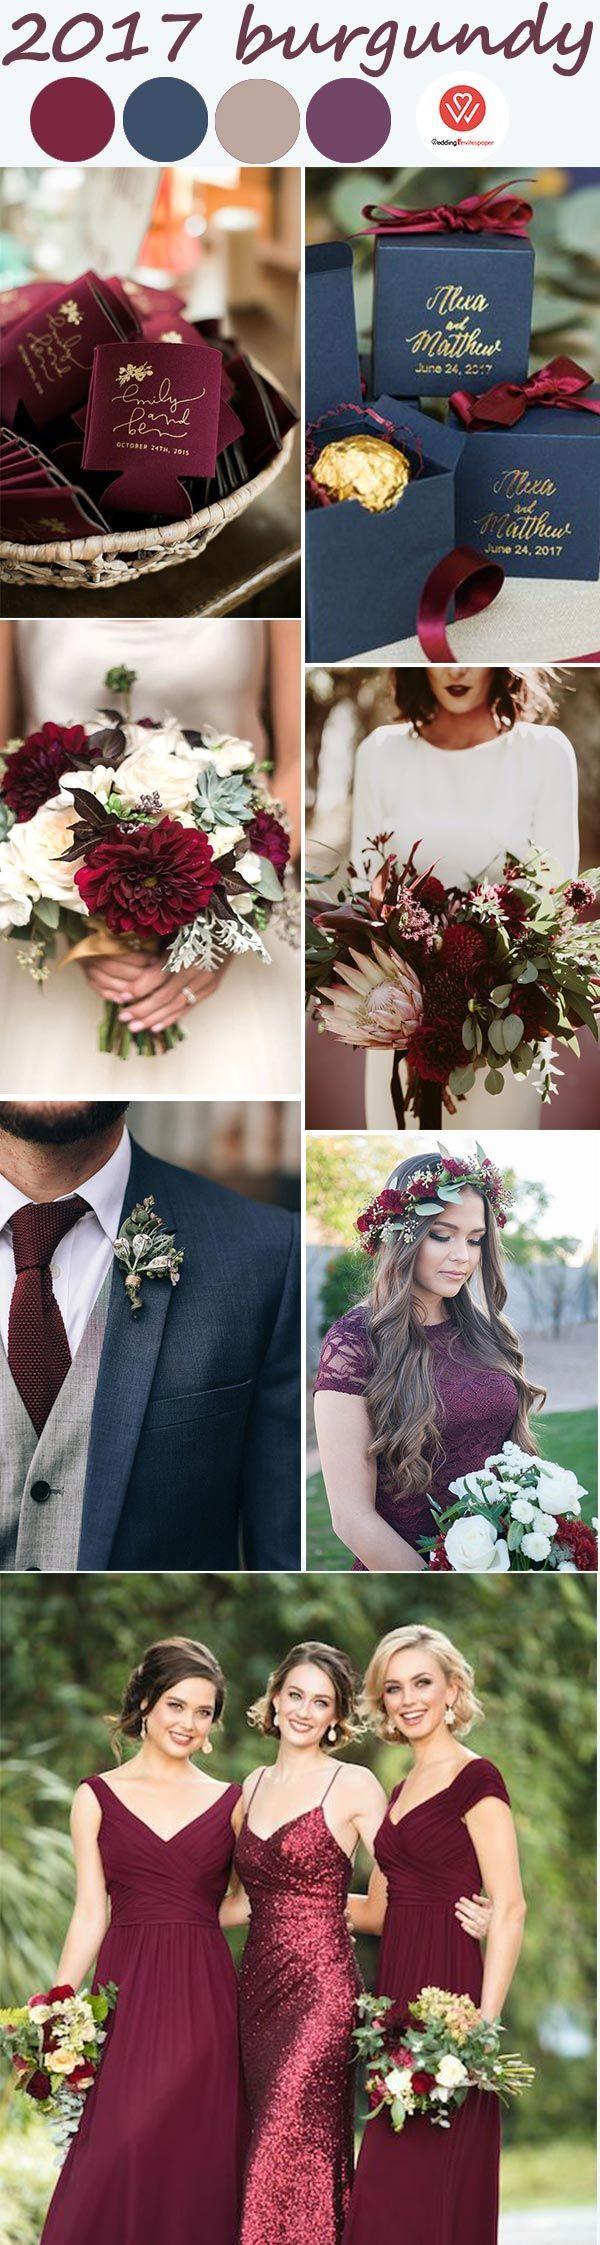 Wedding decorations reception october 2018 burgundy and shade of blue wedding dress navy blue wedding favor